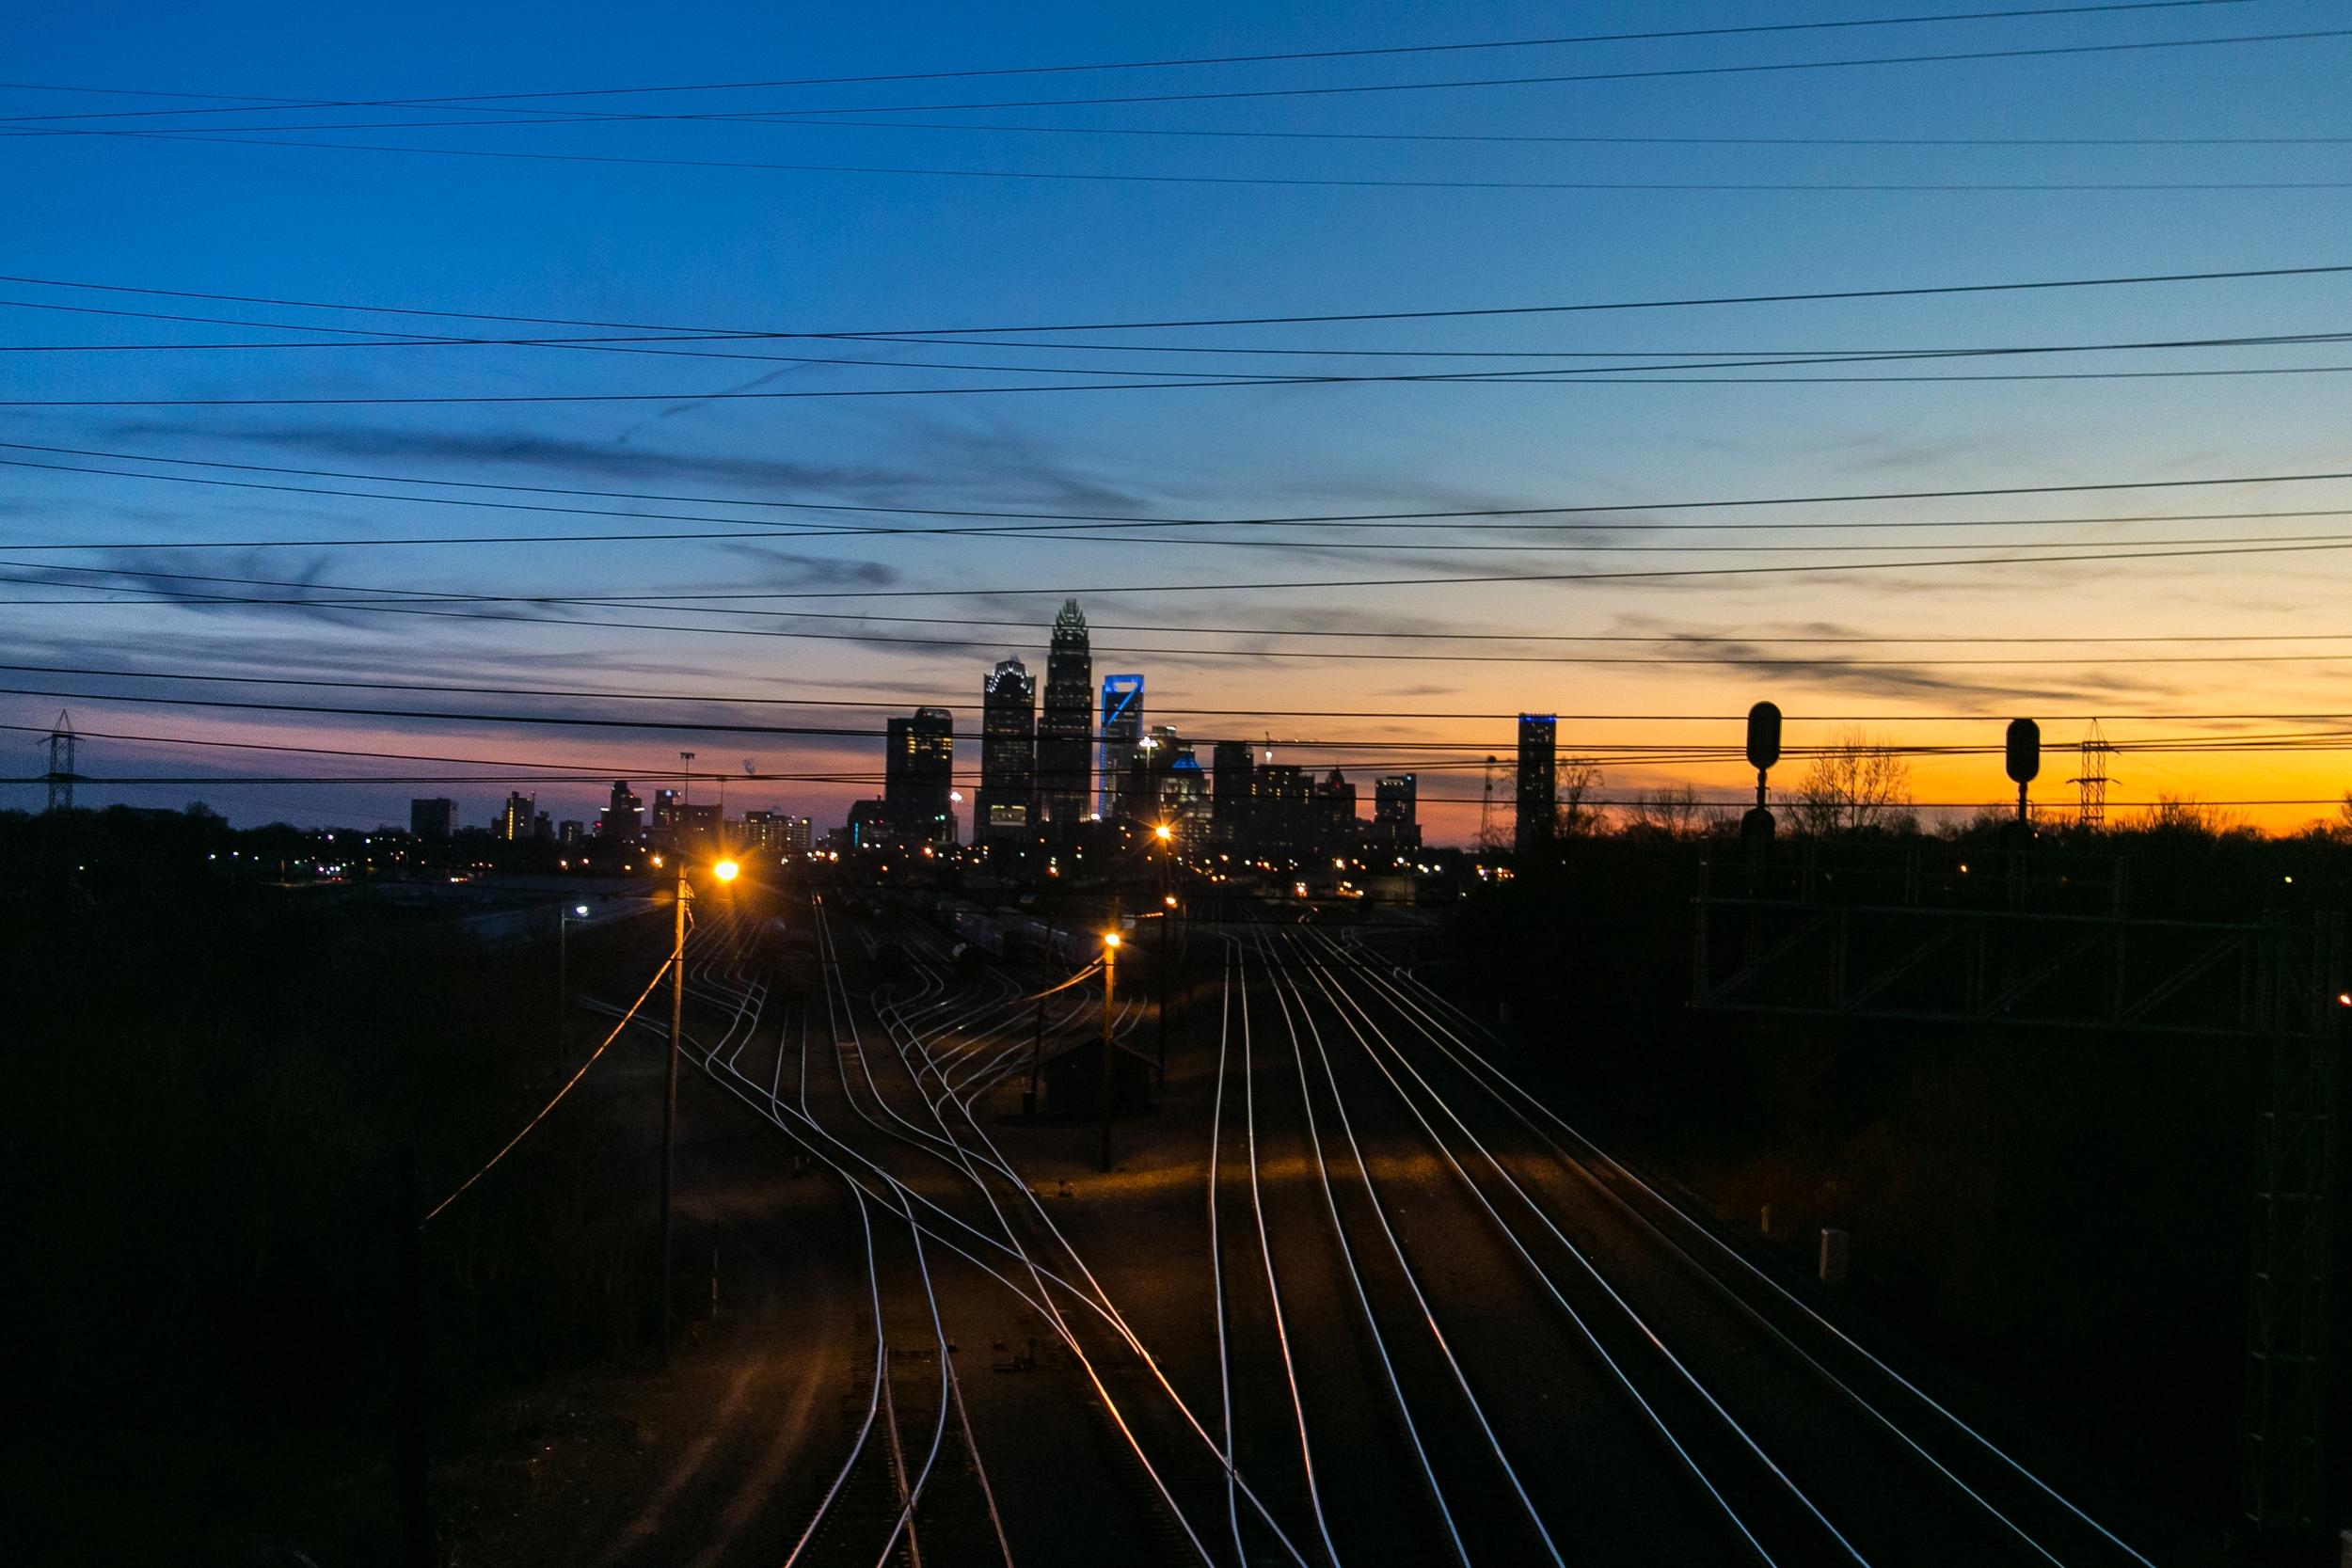 Charlotte Sunset on the Tracks